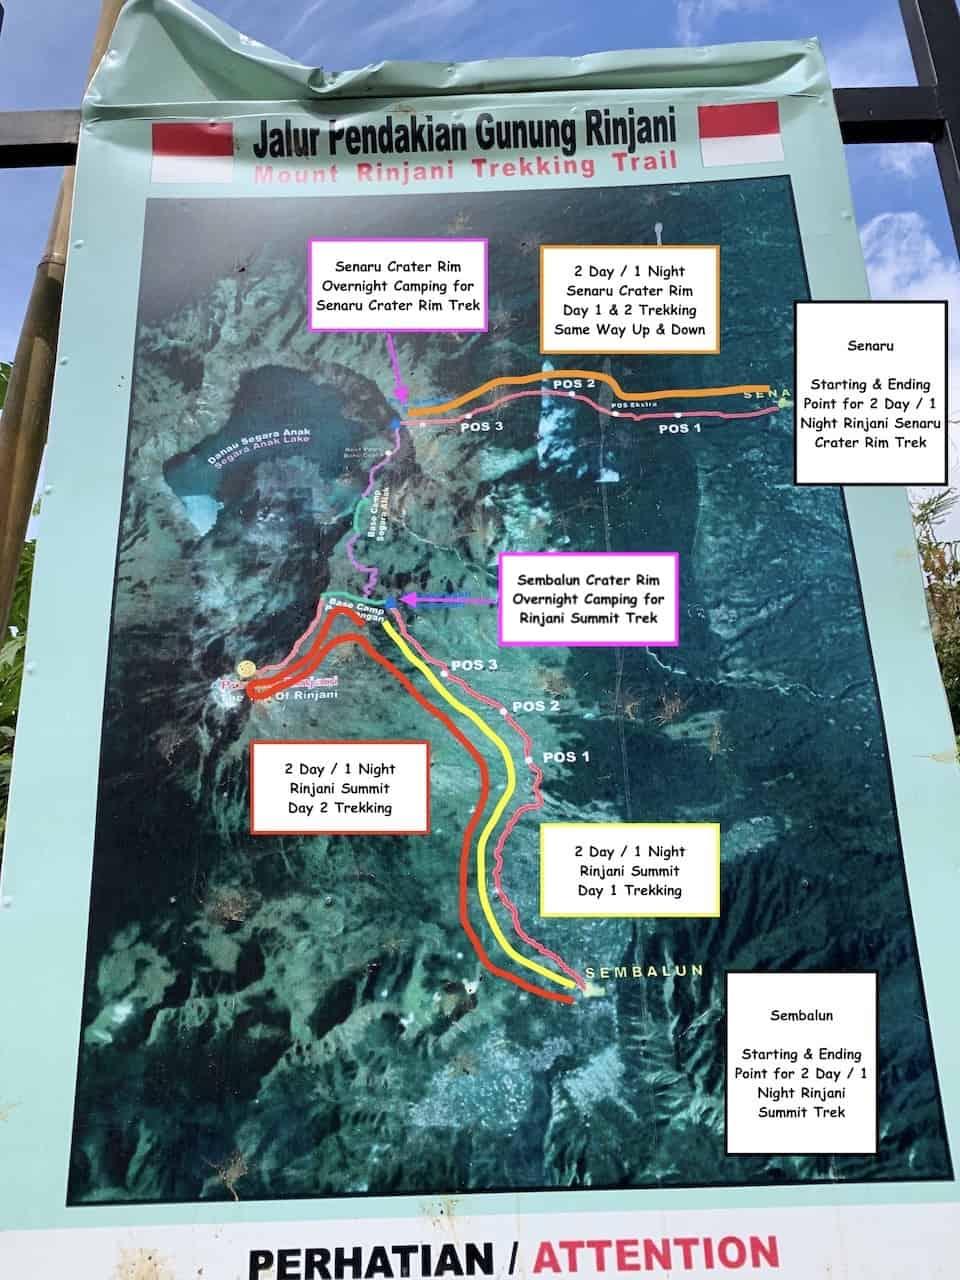 Mount Rinjani Hiking Map Routes